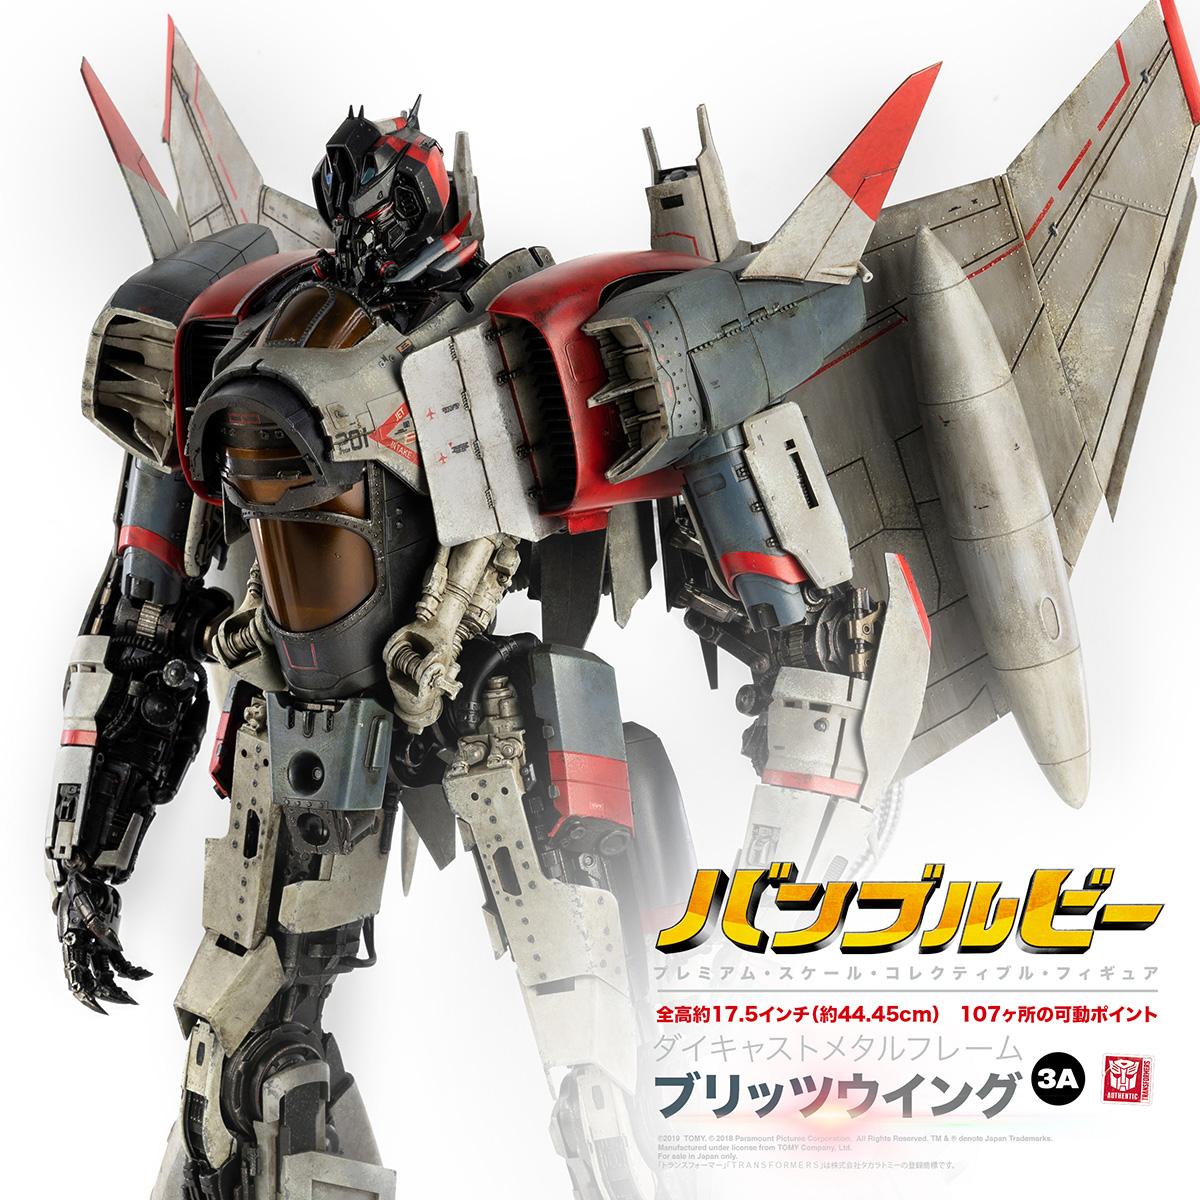 Blitzwing_PM_JAP_0933.jpg